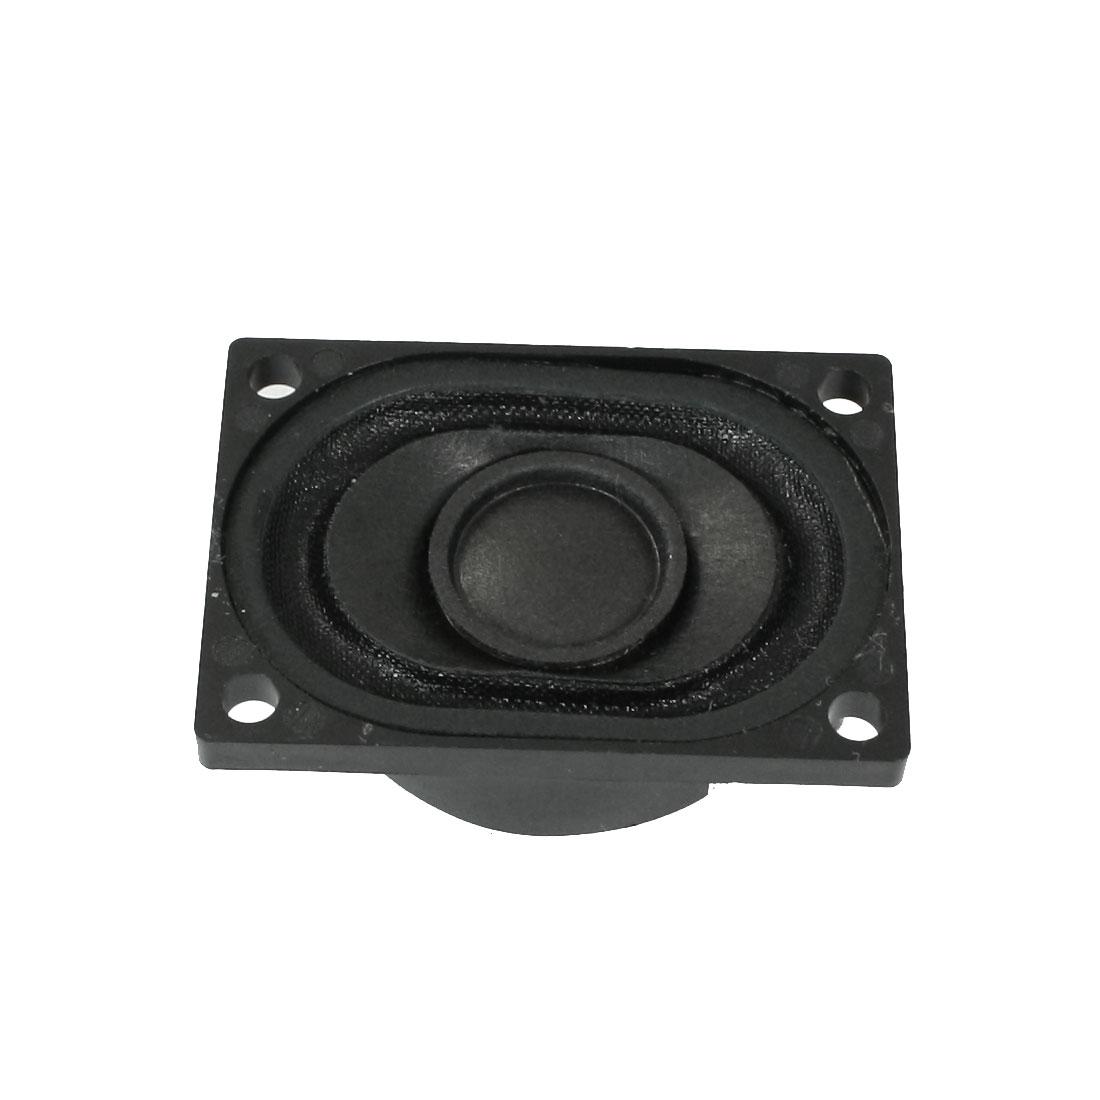 40mmx30mm Rectangle Shape Aluminum Internal Speaker Loudspeaker 8 Ohm 2W